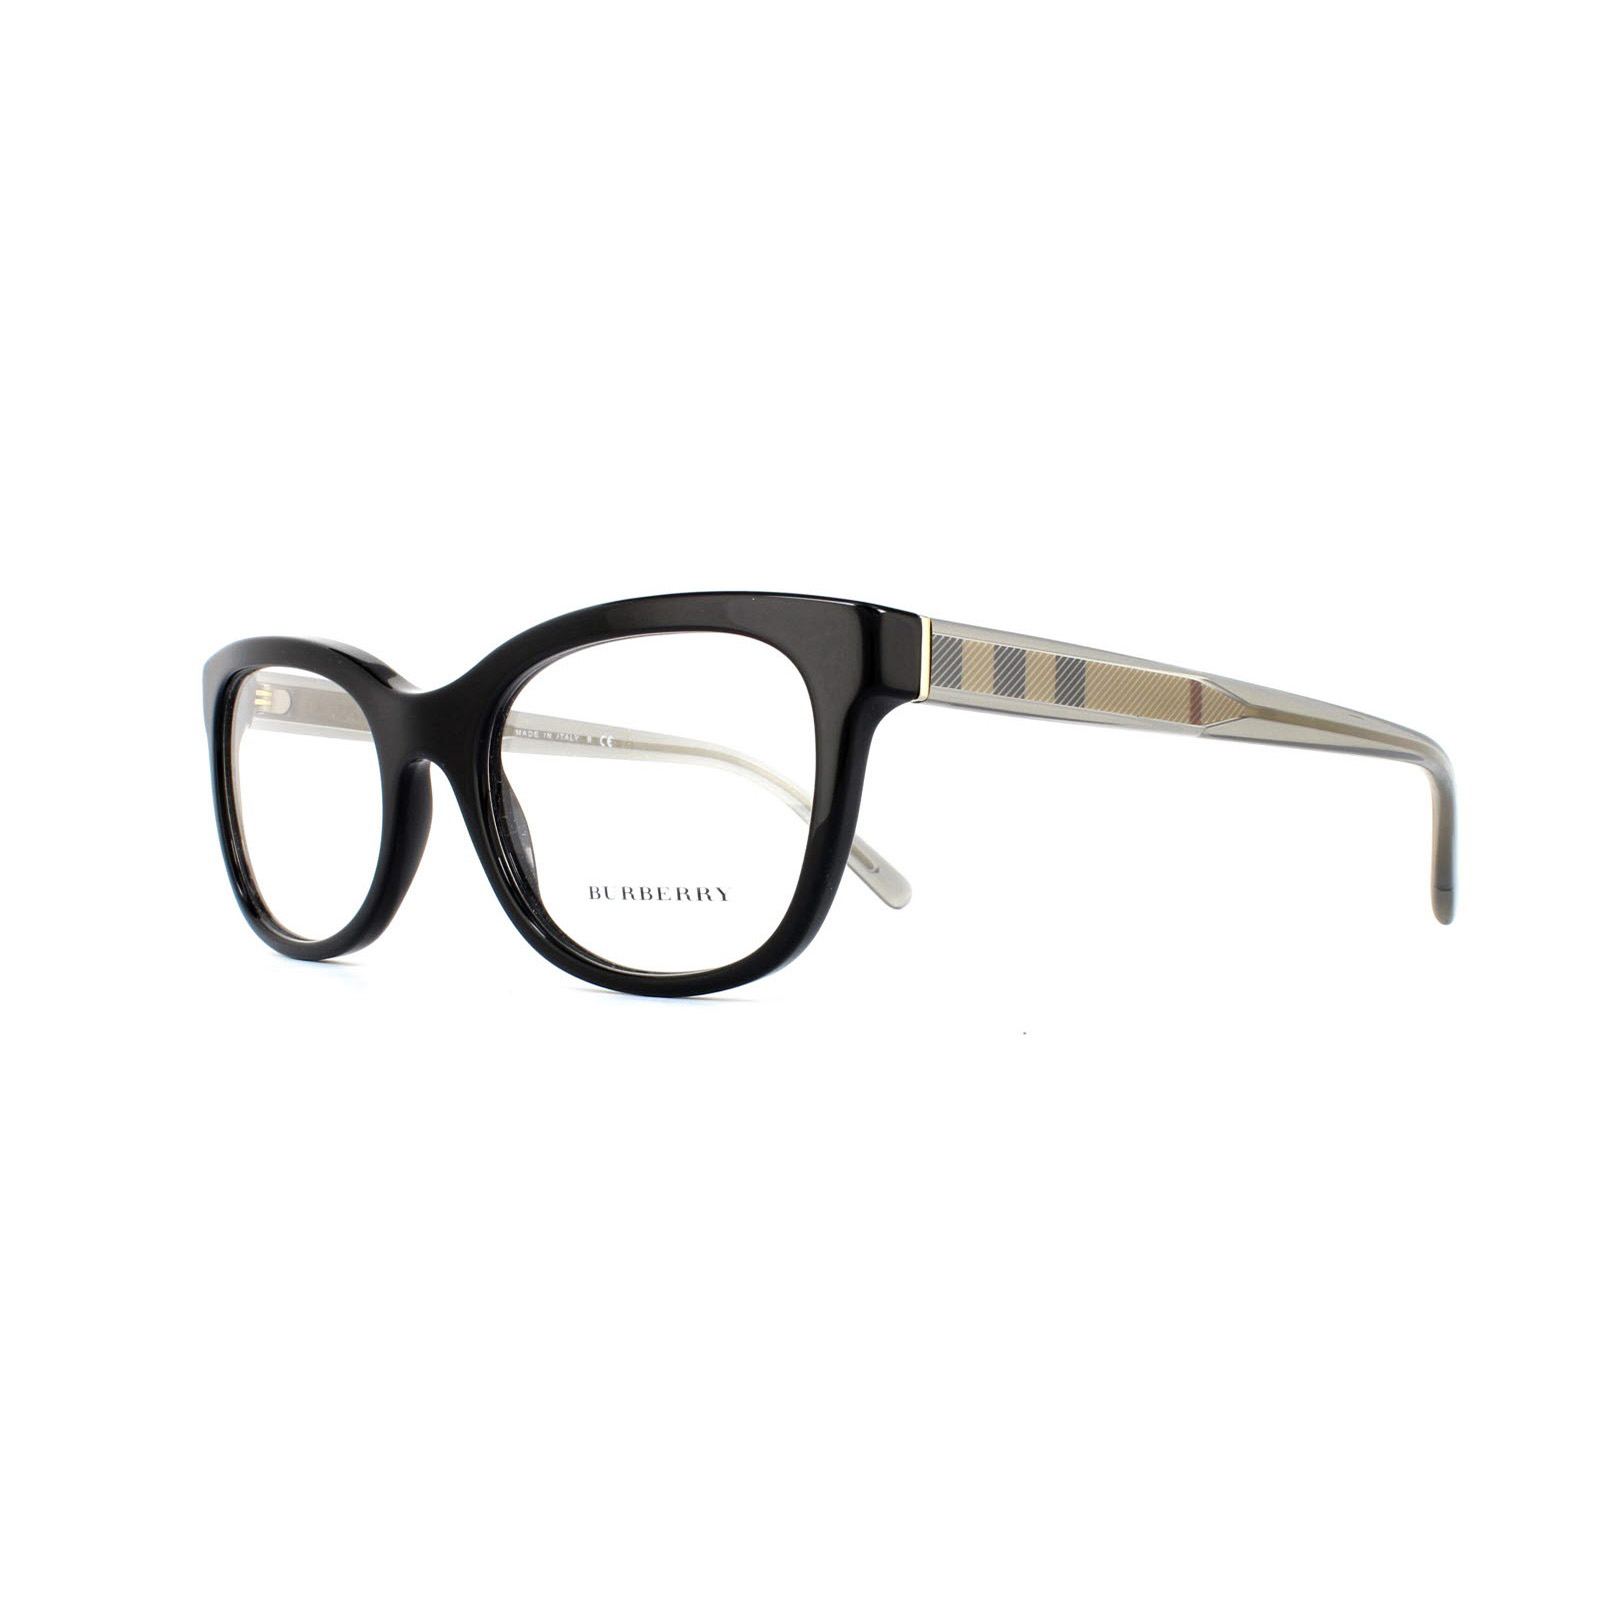 74ef274569b6 Burberry Glasses Frames 2213 3001 Black 51mm Womens 8053672187410